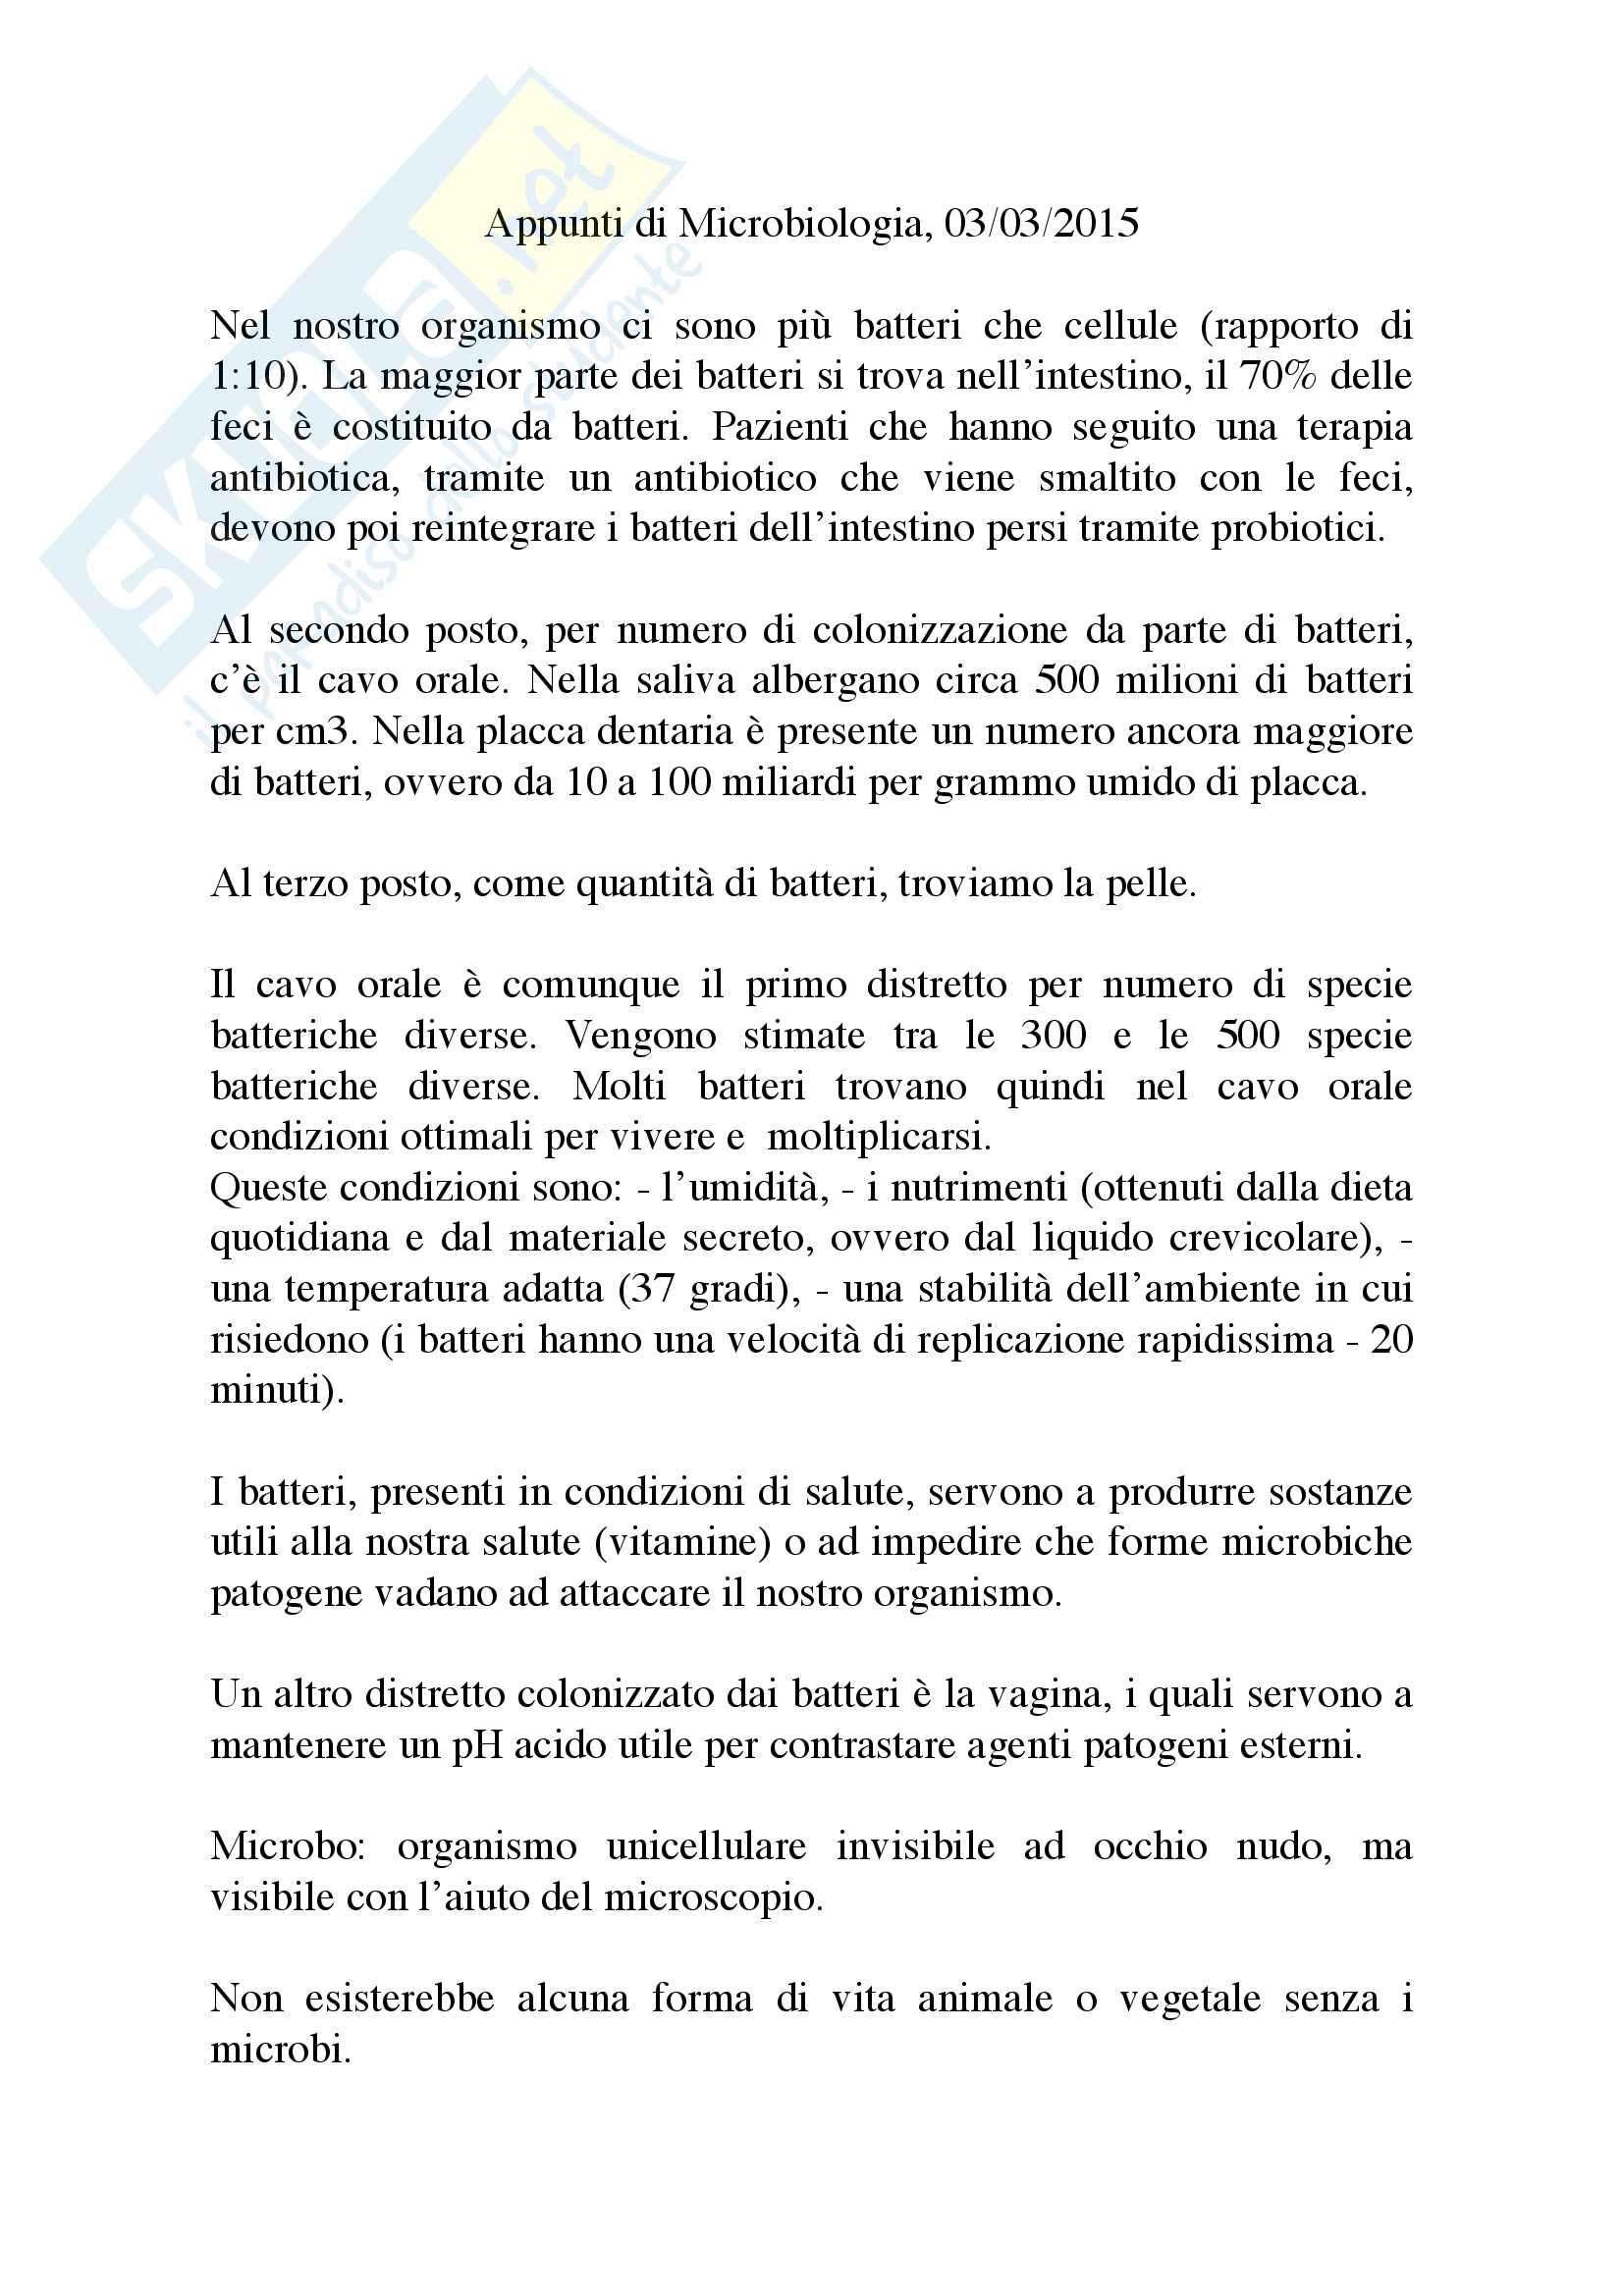 Appunti Microbiologia Prof Mattina